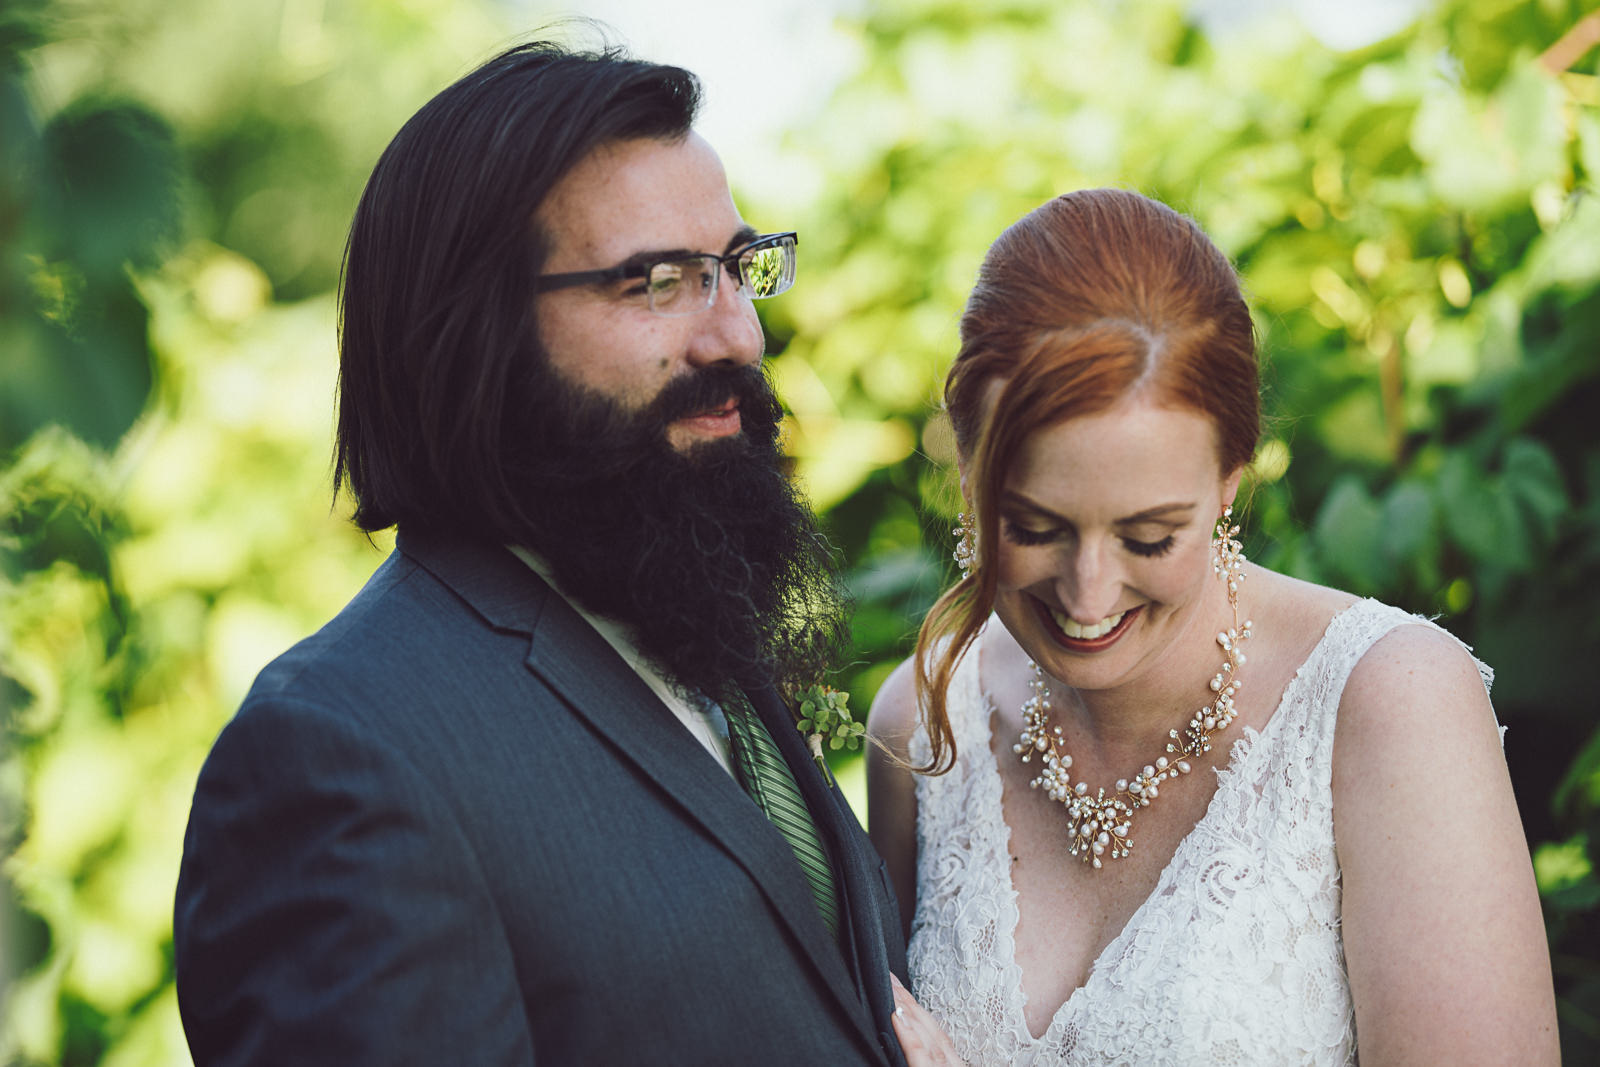 wedding-keely-caleb-225-name-your-photo.jpg